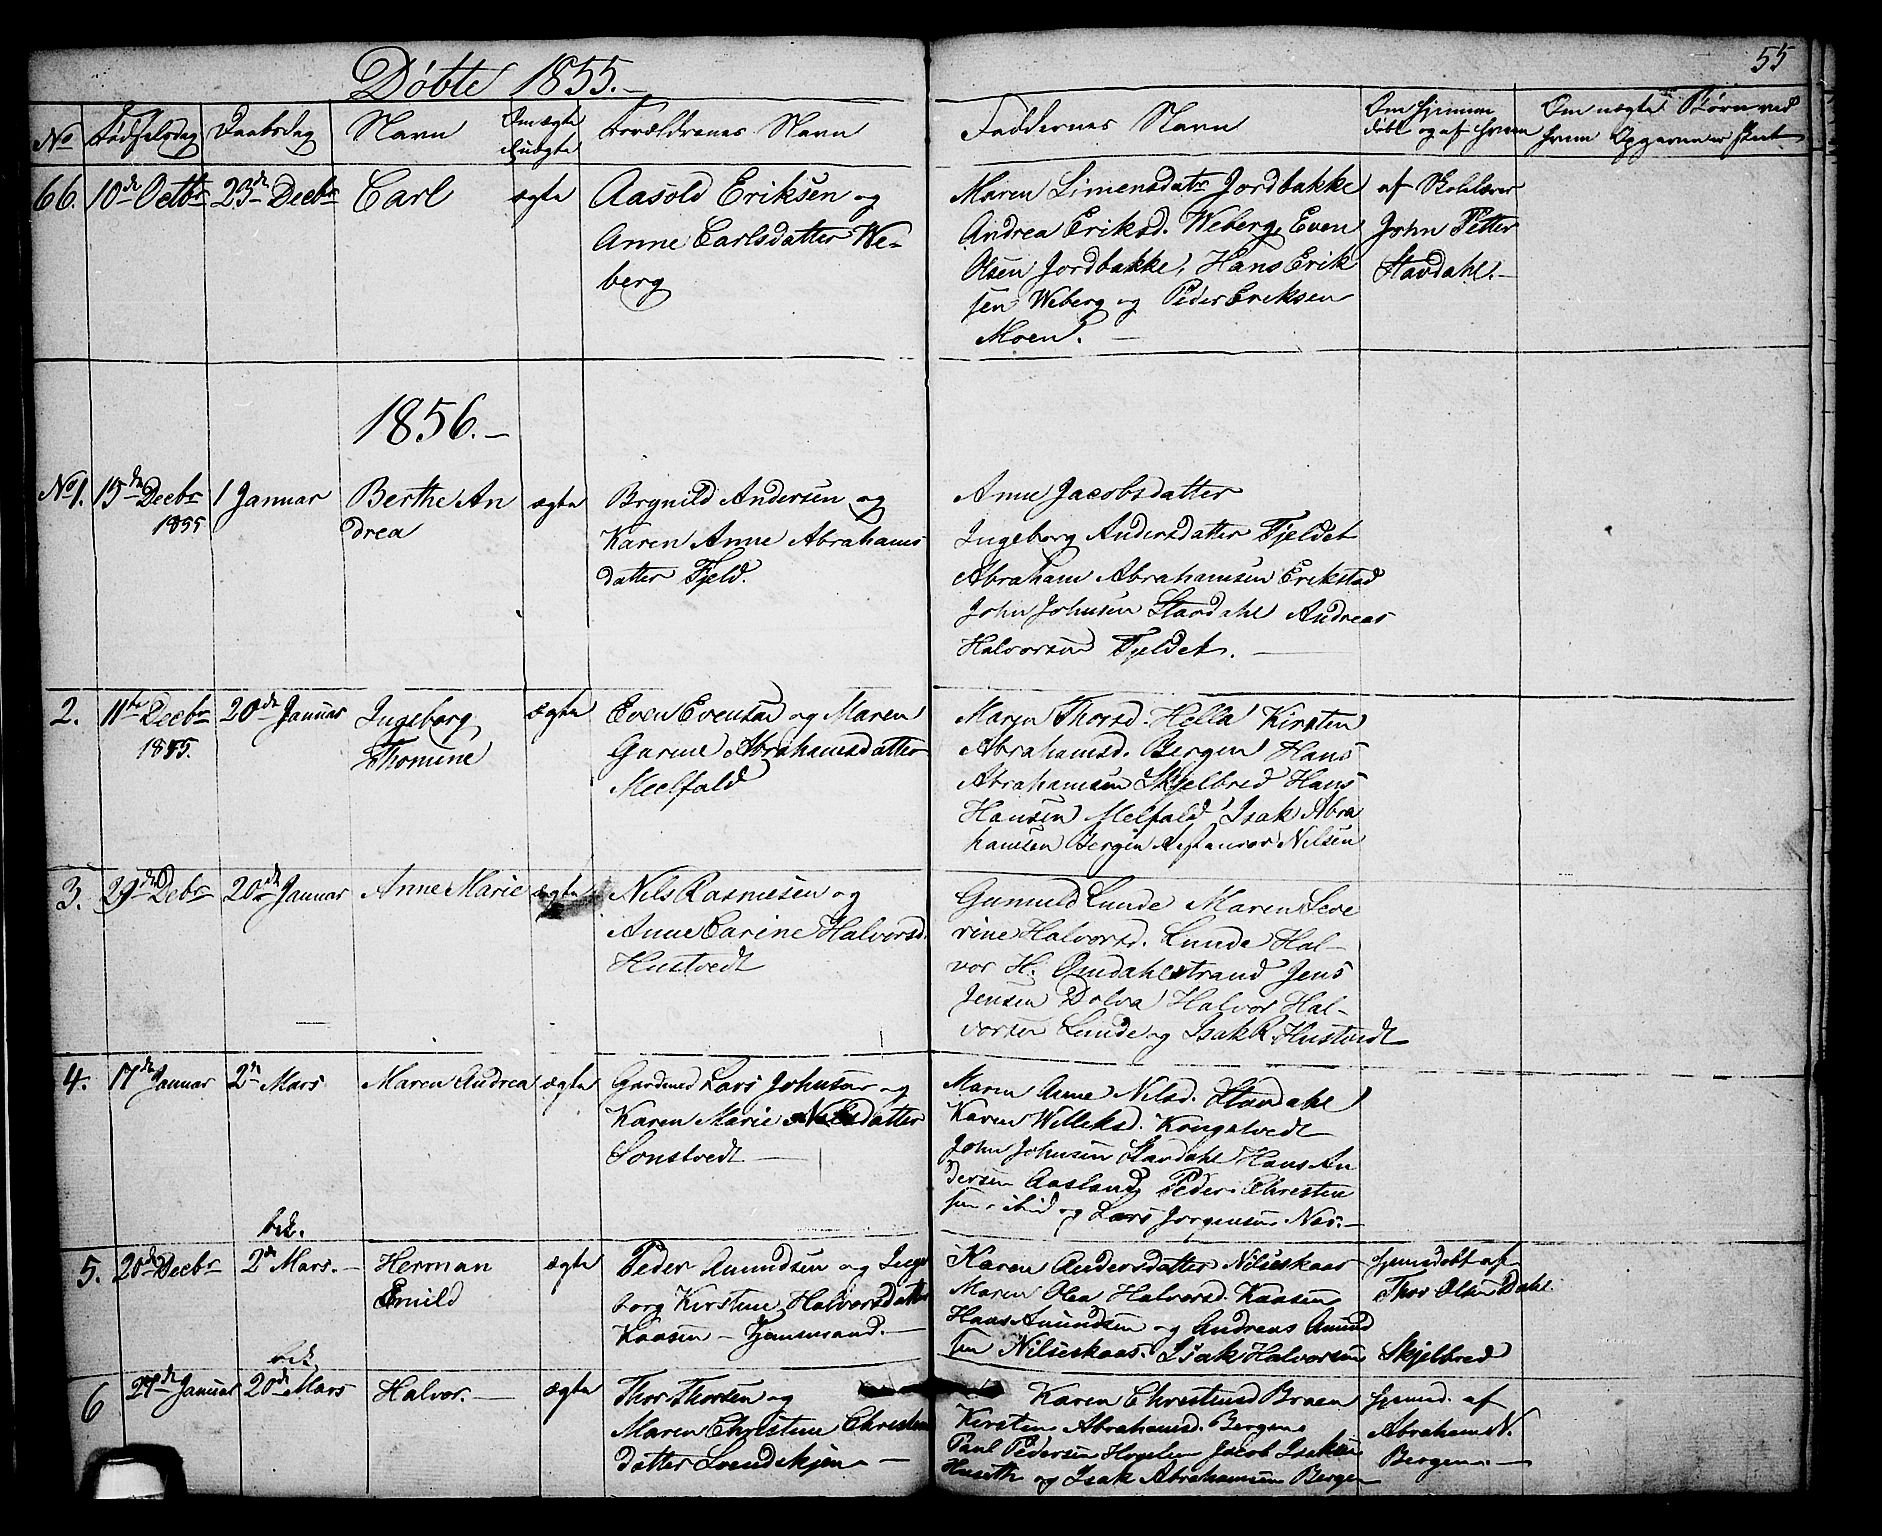 SAKO, Solum kirkebøker, G/Gb/L0001: Klokkerbok nr. II 1, 1848-1859, s. 55